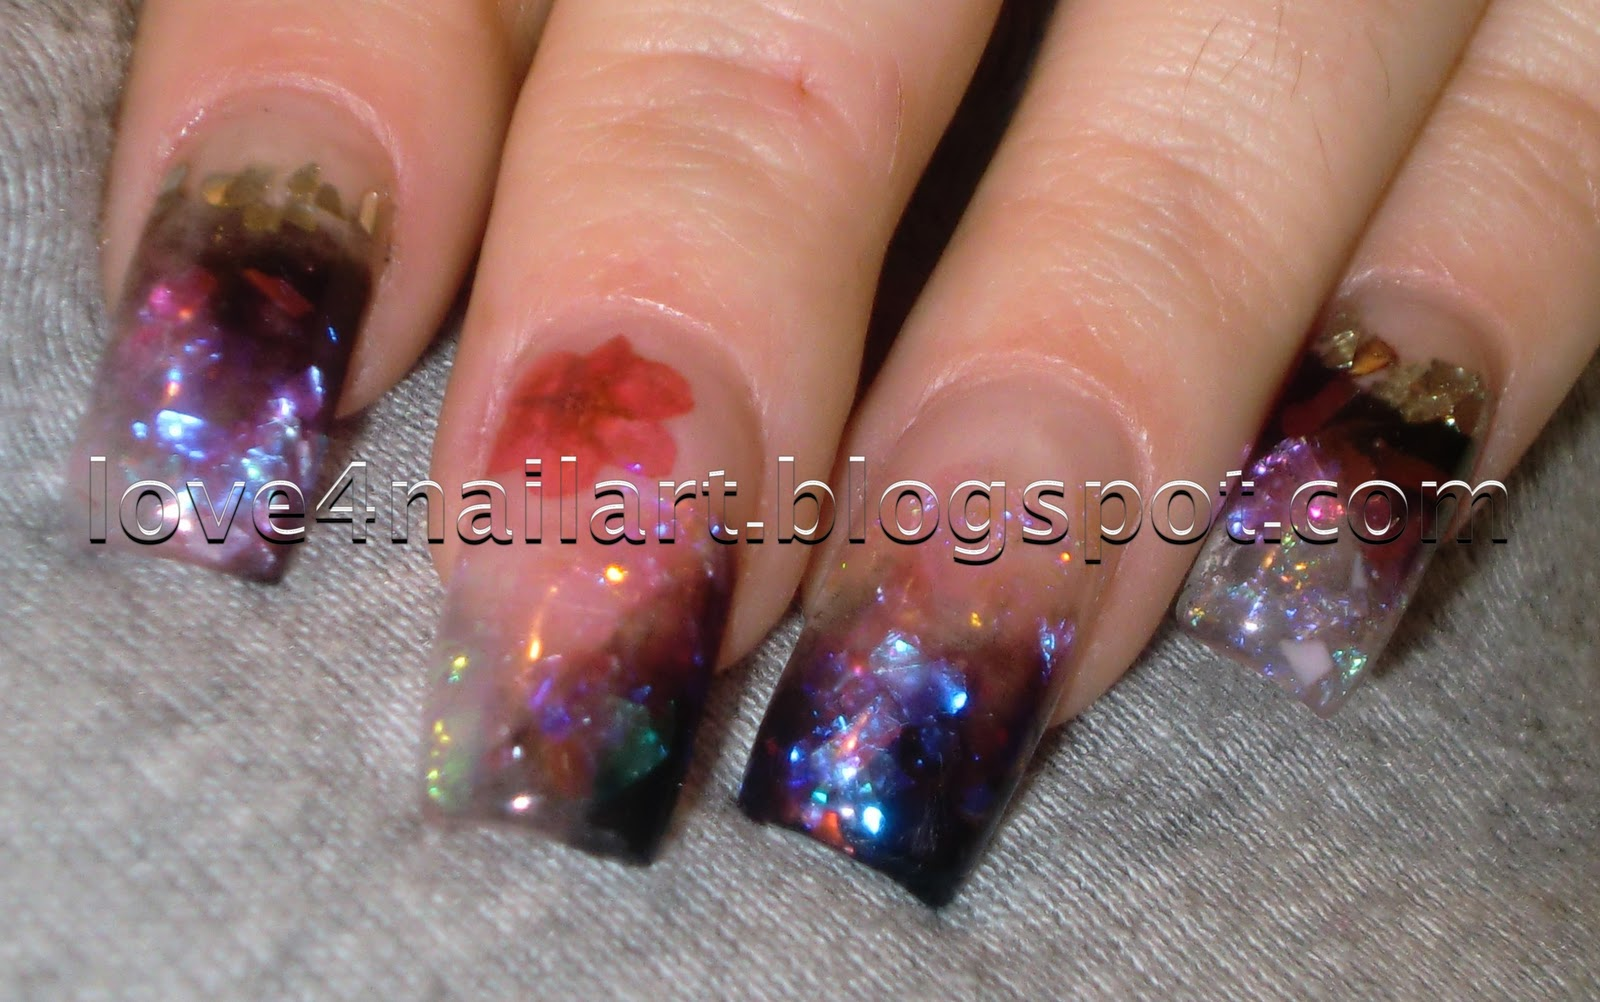 Love4nailart ice mylar flakes w encapsulated flower nails ice mylar flakes w encapsulated flower nails prinsesfo Choice Image